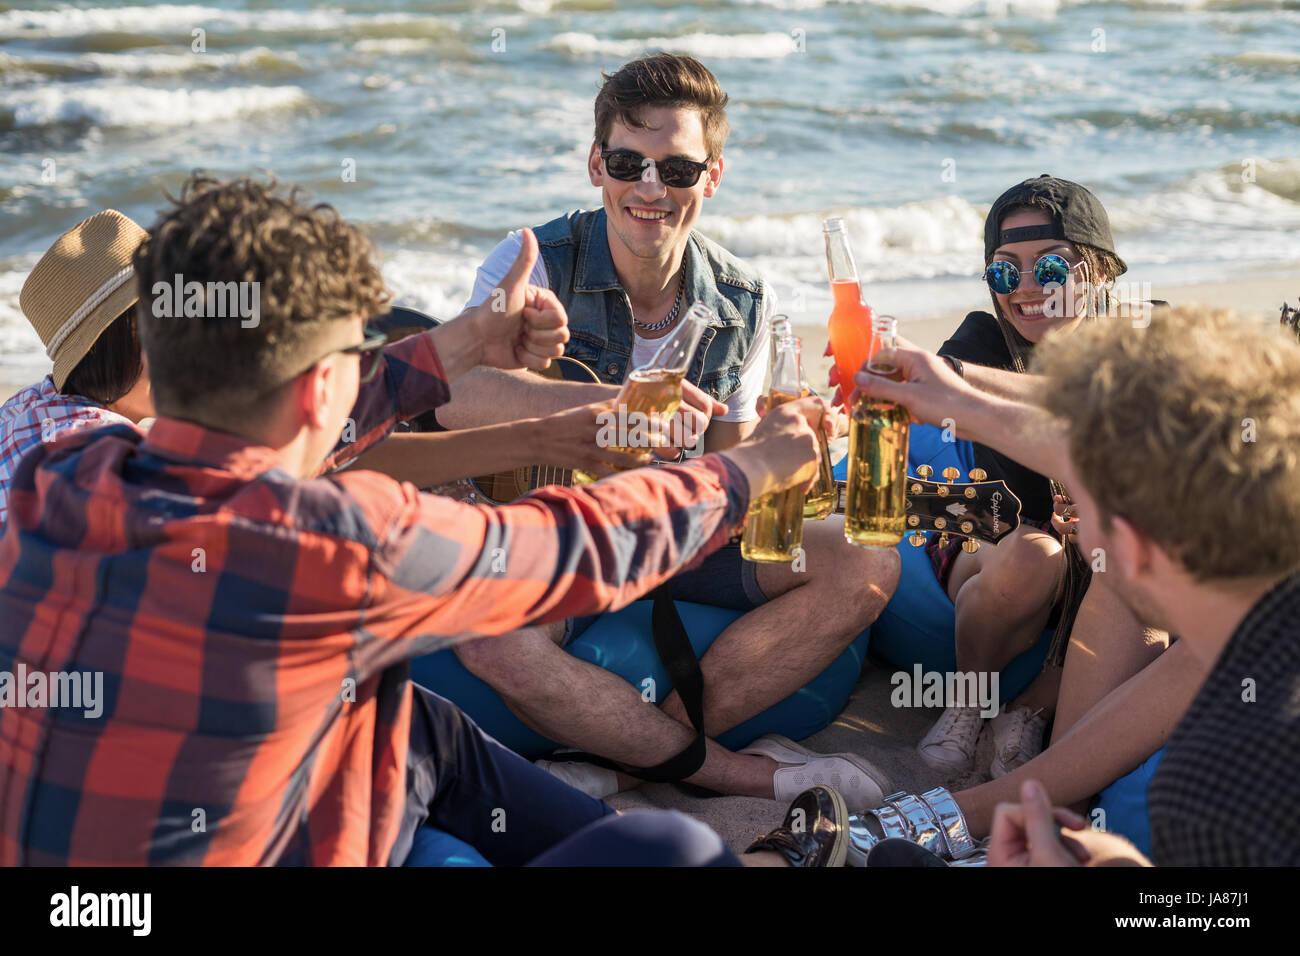 Groupe d'amis sur le drindking beach party Photo Stock